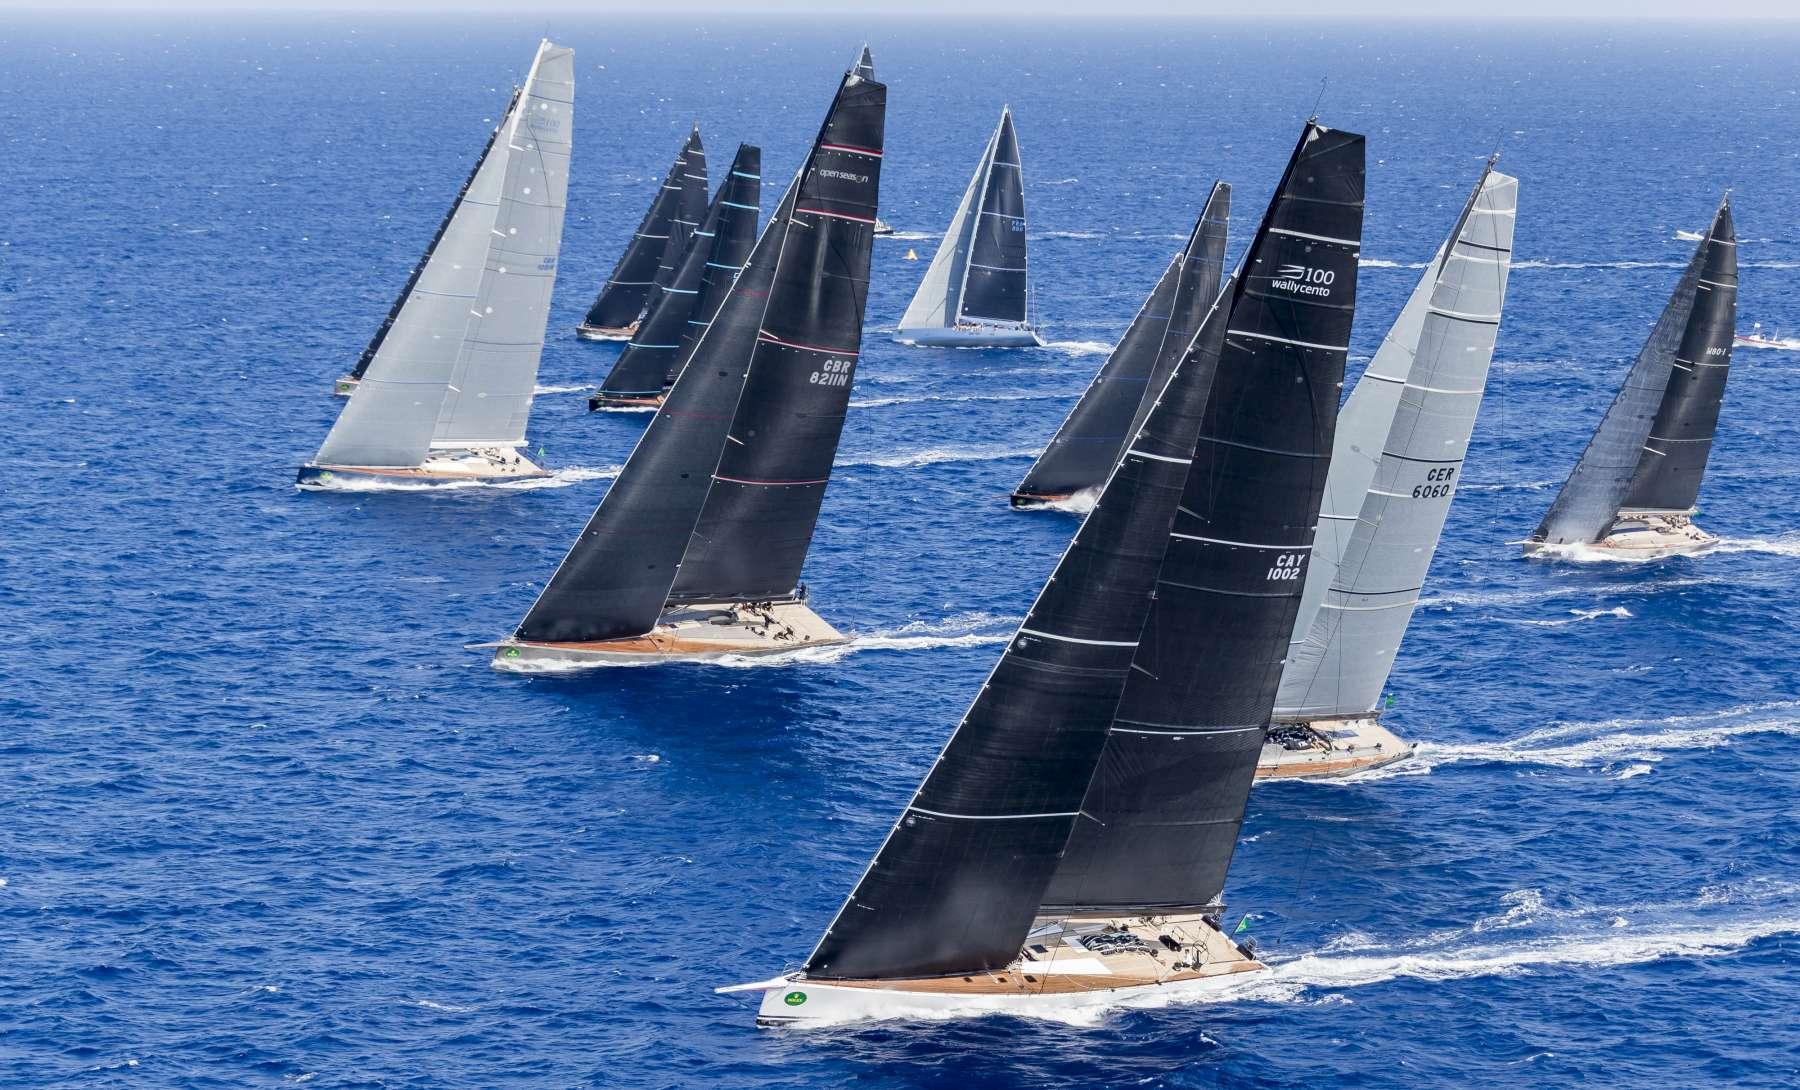 Momo and Galateia lengthen their Class leads - NEWS - Yacht Club Costa Smeralda